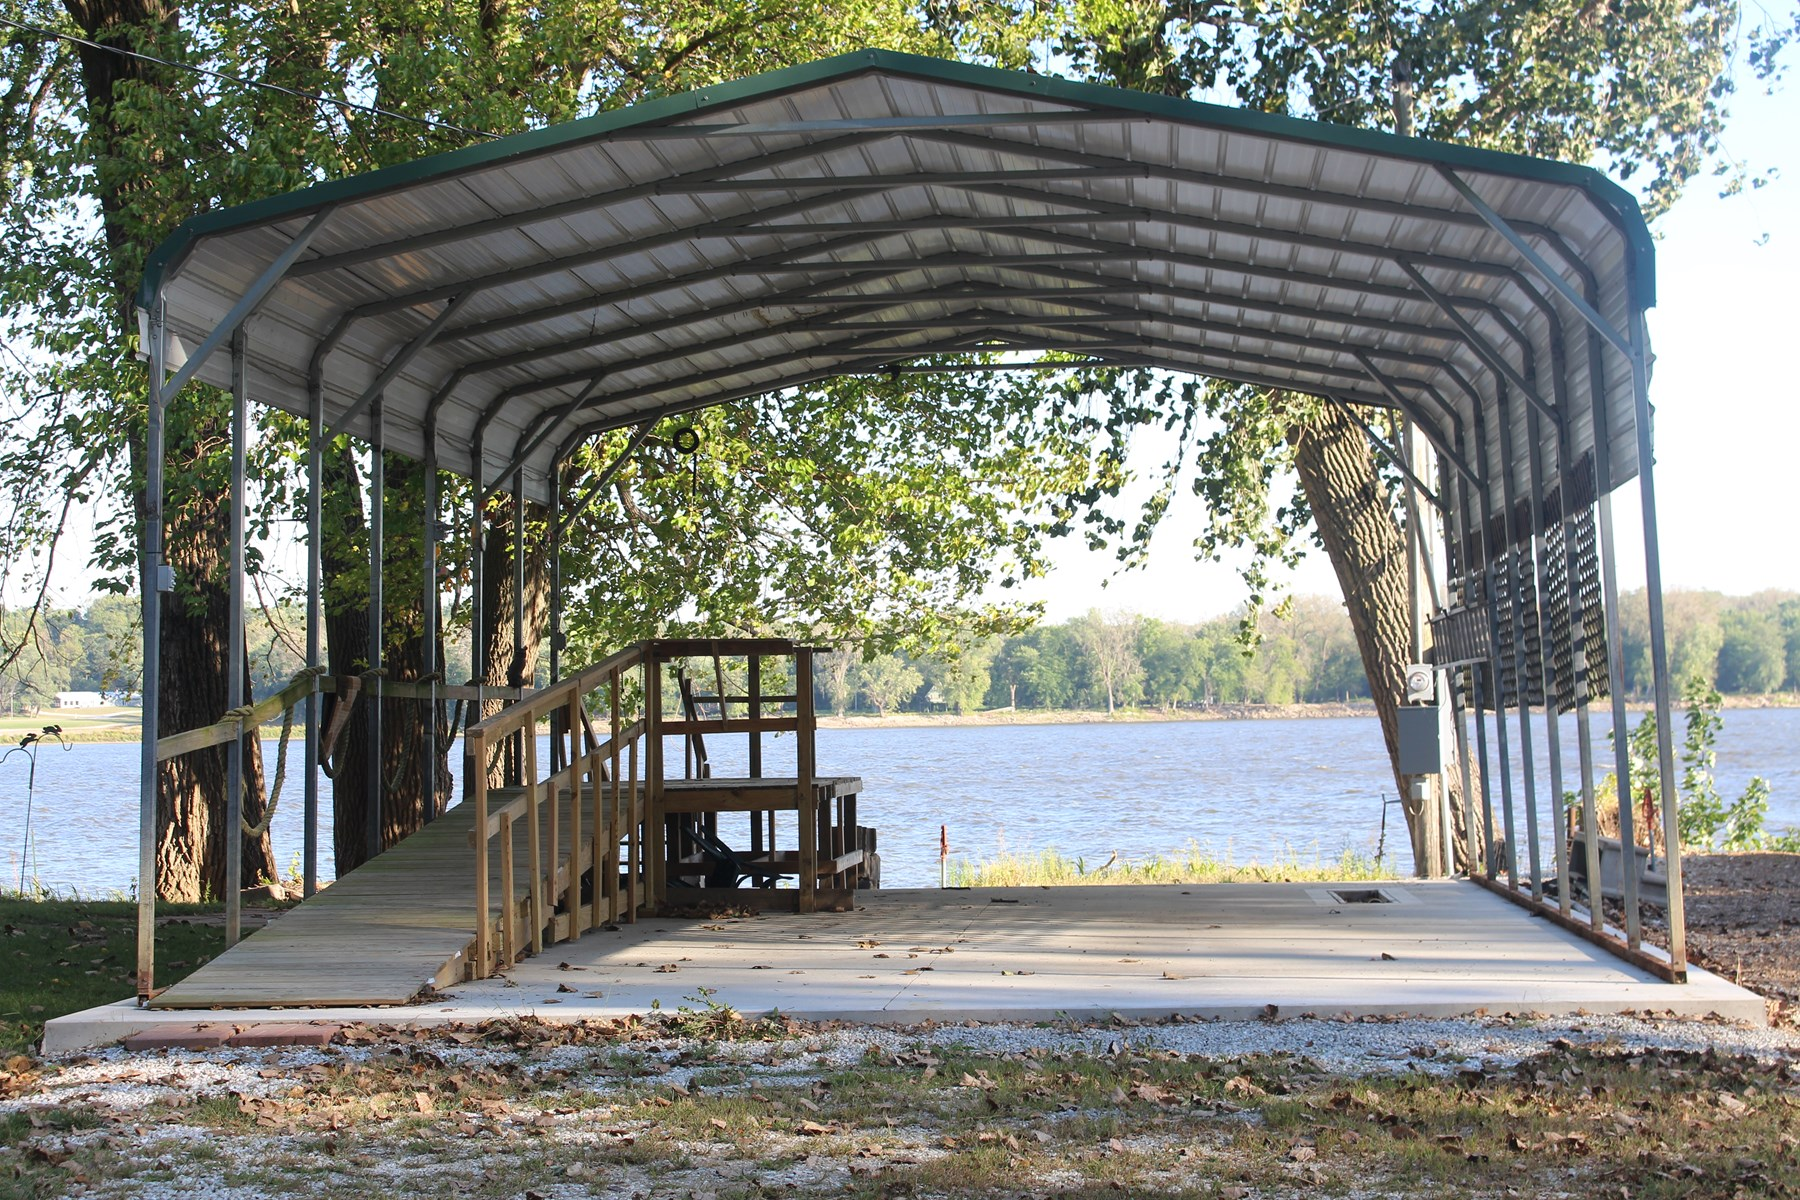 MO Riverfront Lot For Sale, Mississippi Riverfront Property